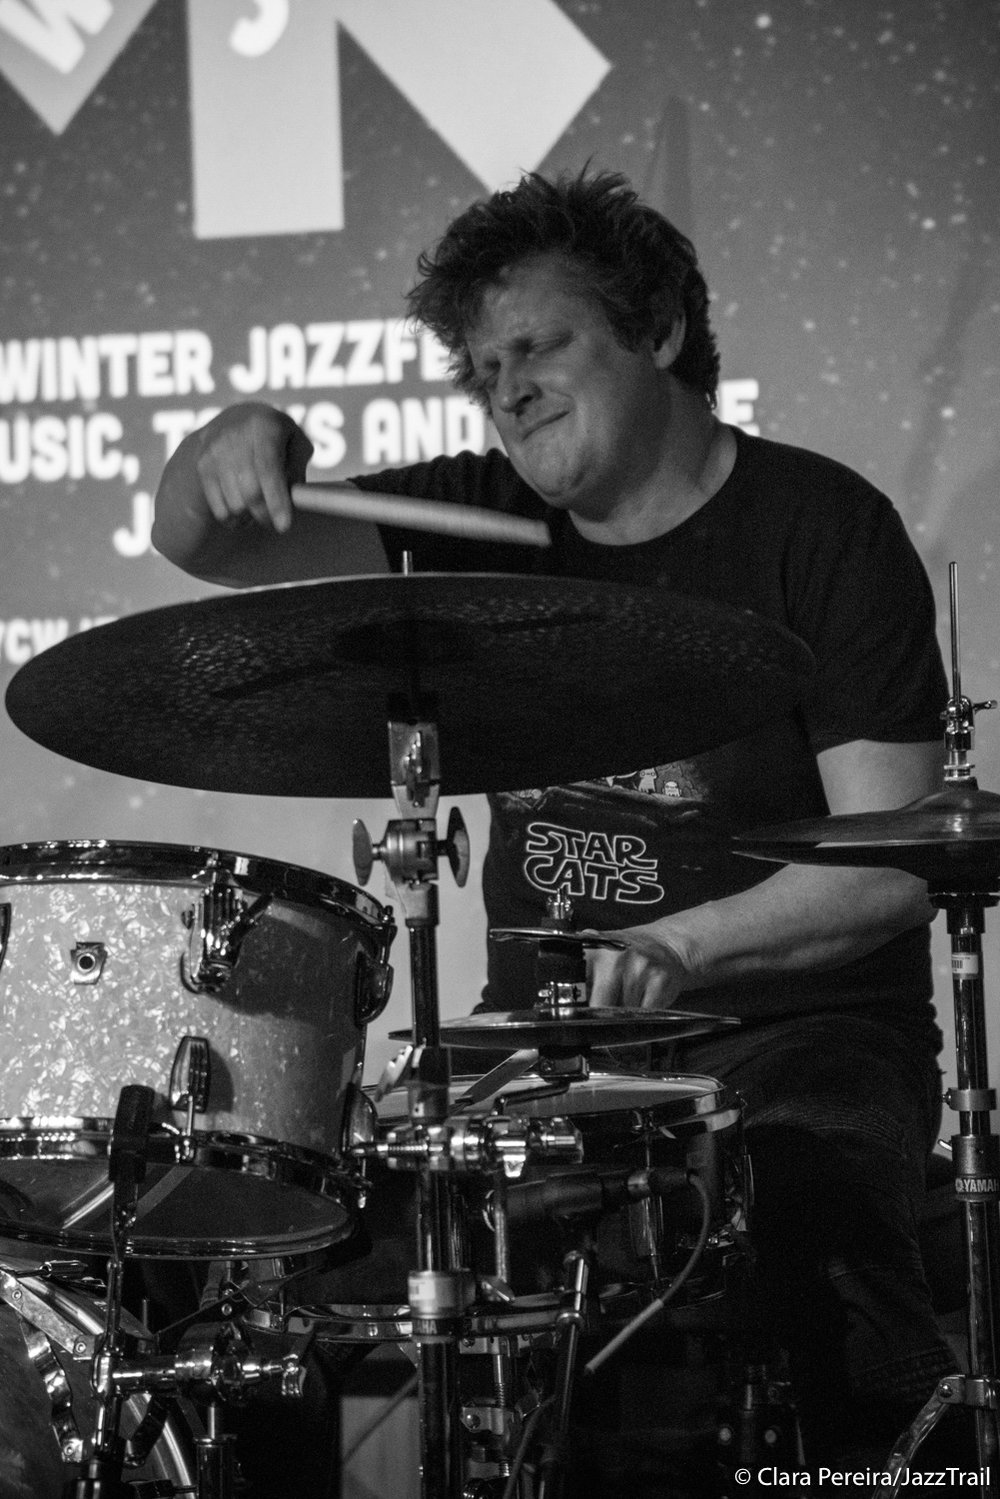 Jim Black, 2018